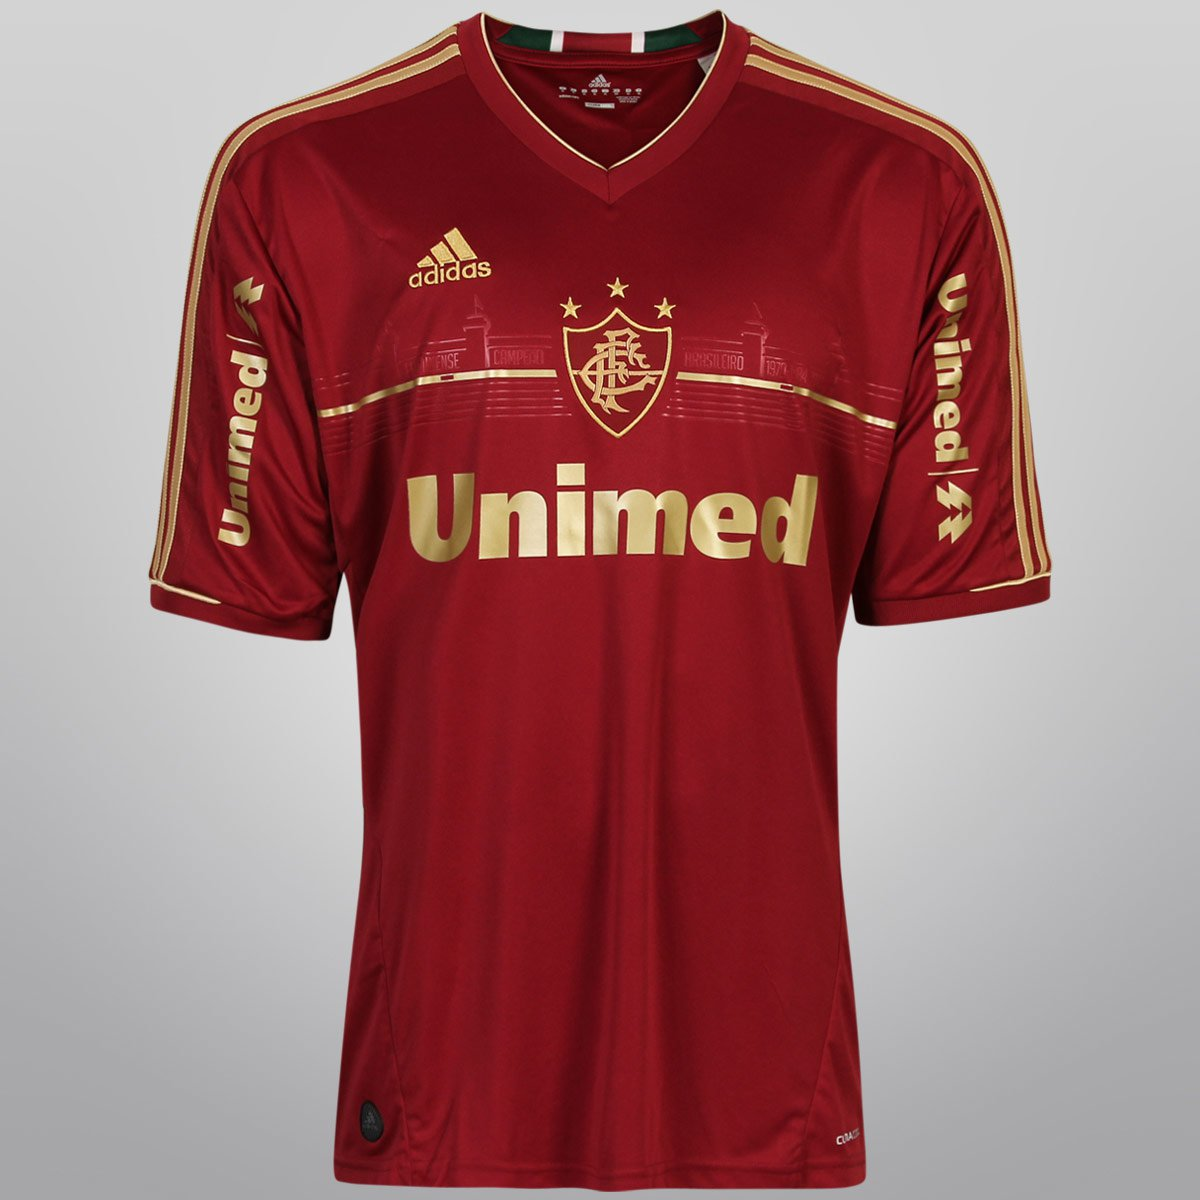 dc6e401563 Camisa Adidas Fluminense III 12 13 s nº - Compre Agora